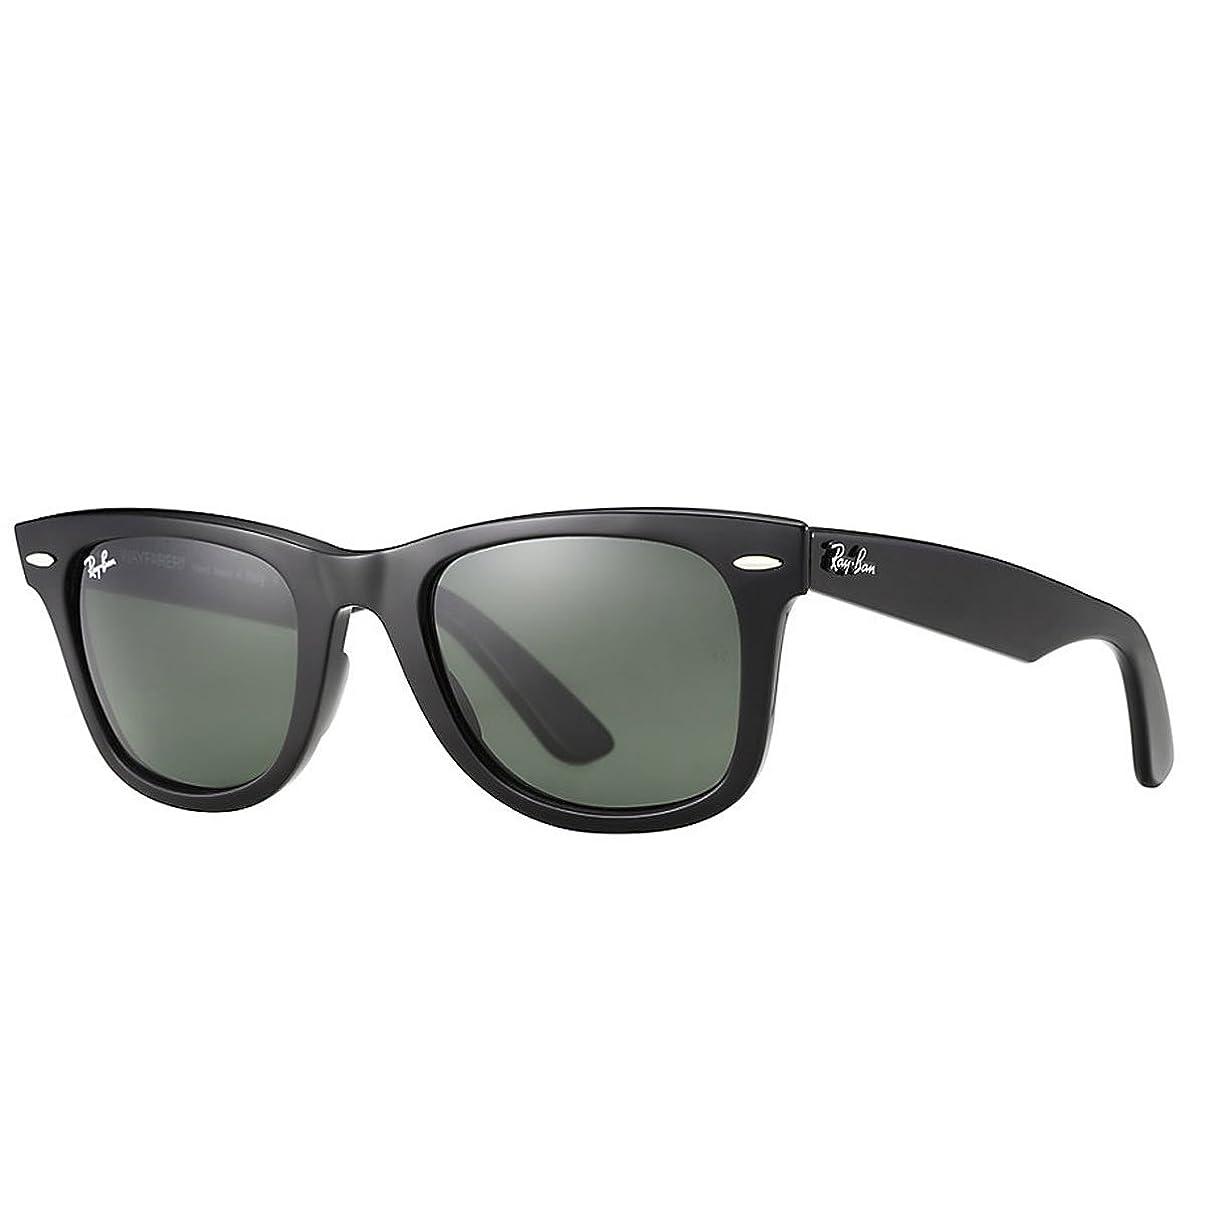 Ray-Ban, RB2140 Original Wayfarer Sunglasses, Unisex Ray-Ban Glasses, 100% UV Protection, Non-Polarized, Reduce Eye Strain, Lightweight Acetate Frame, Prescription-Ready Lenses, 54 mm Frame